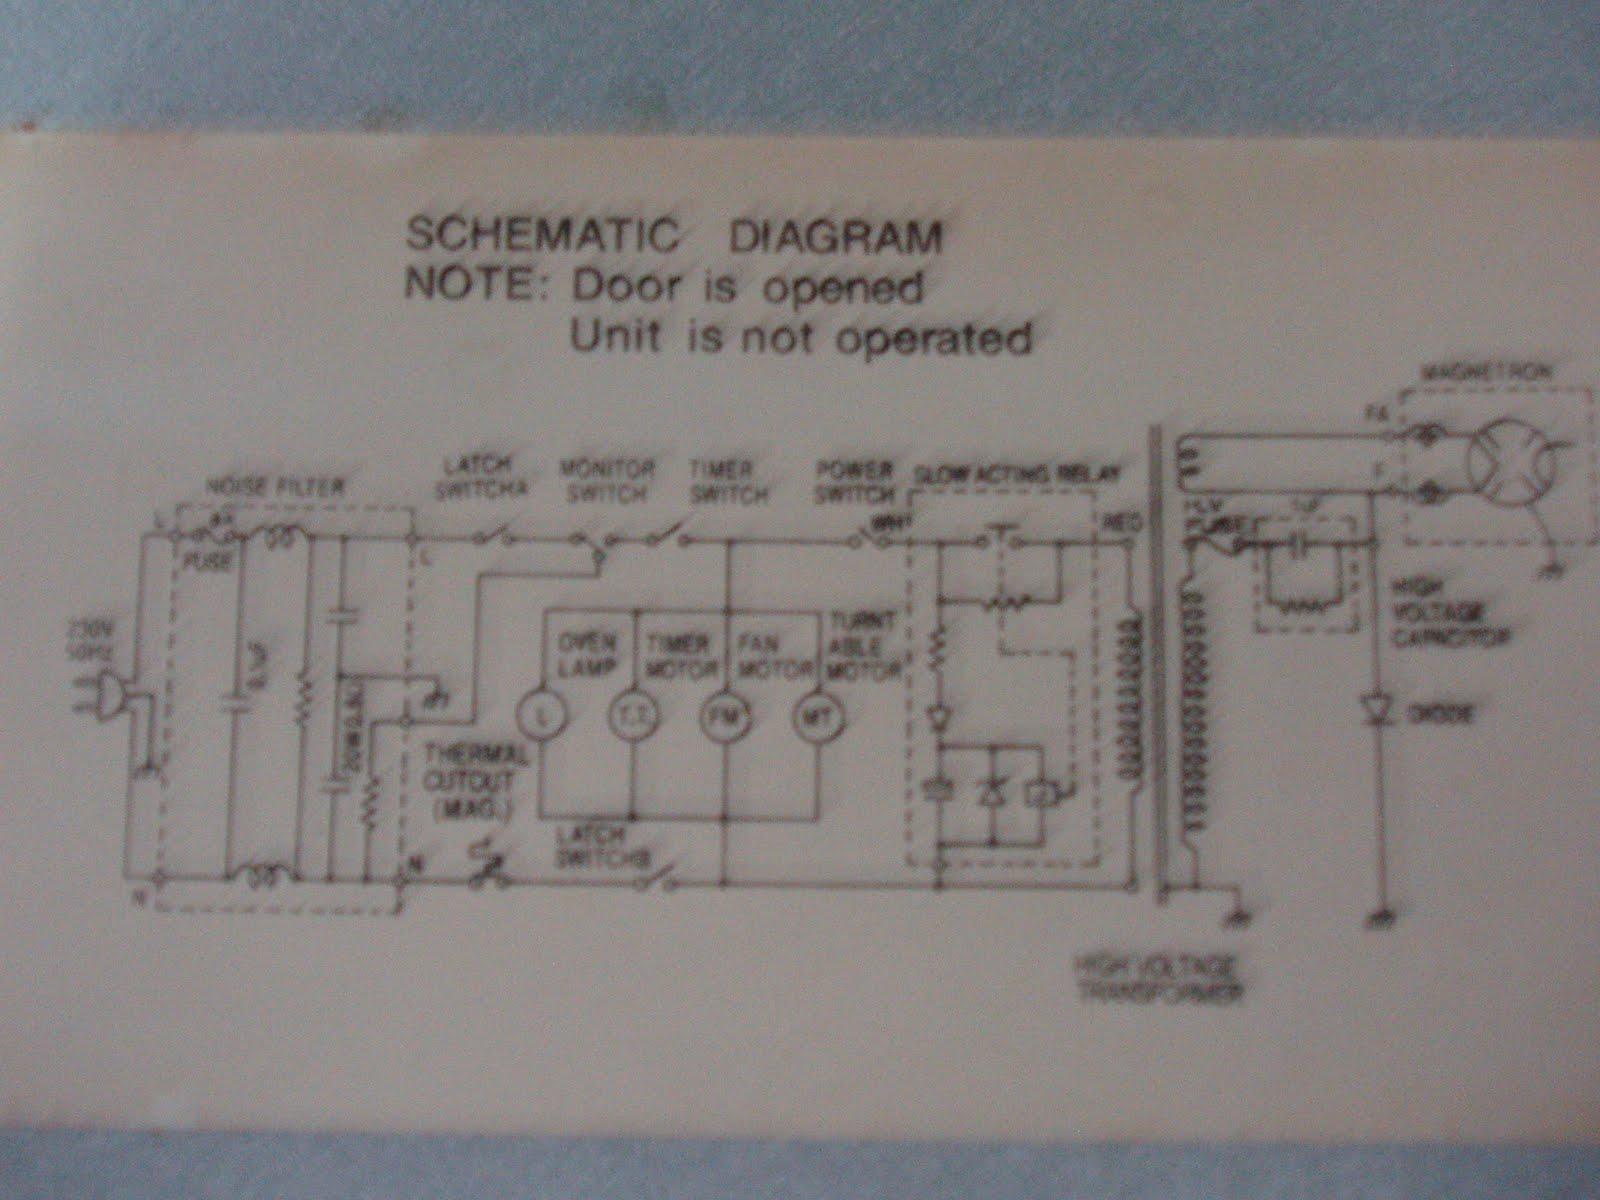 general electric oven wiring diagram 2005 chevy silverado 2500hd radio ge microwave library vintage 1200w